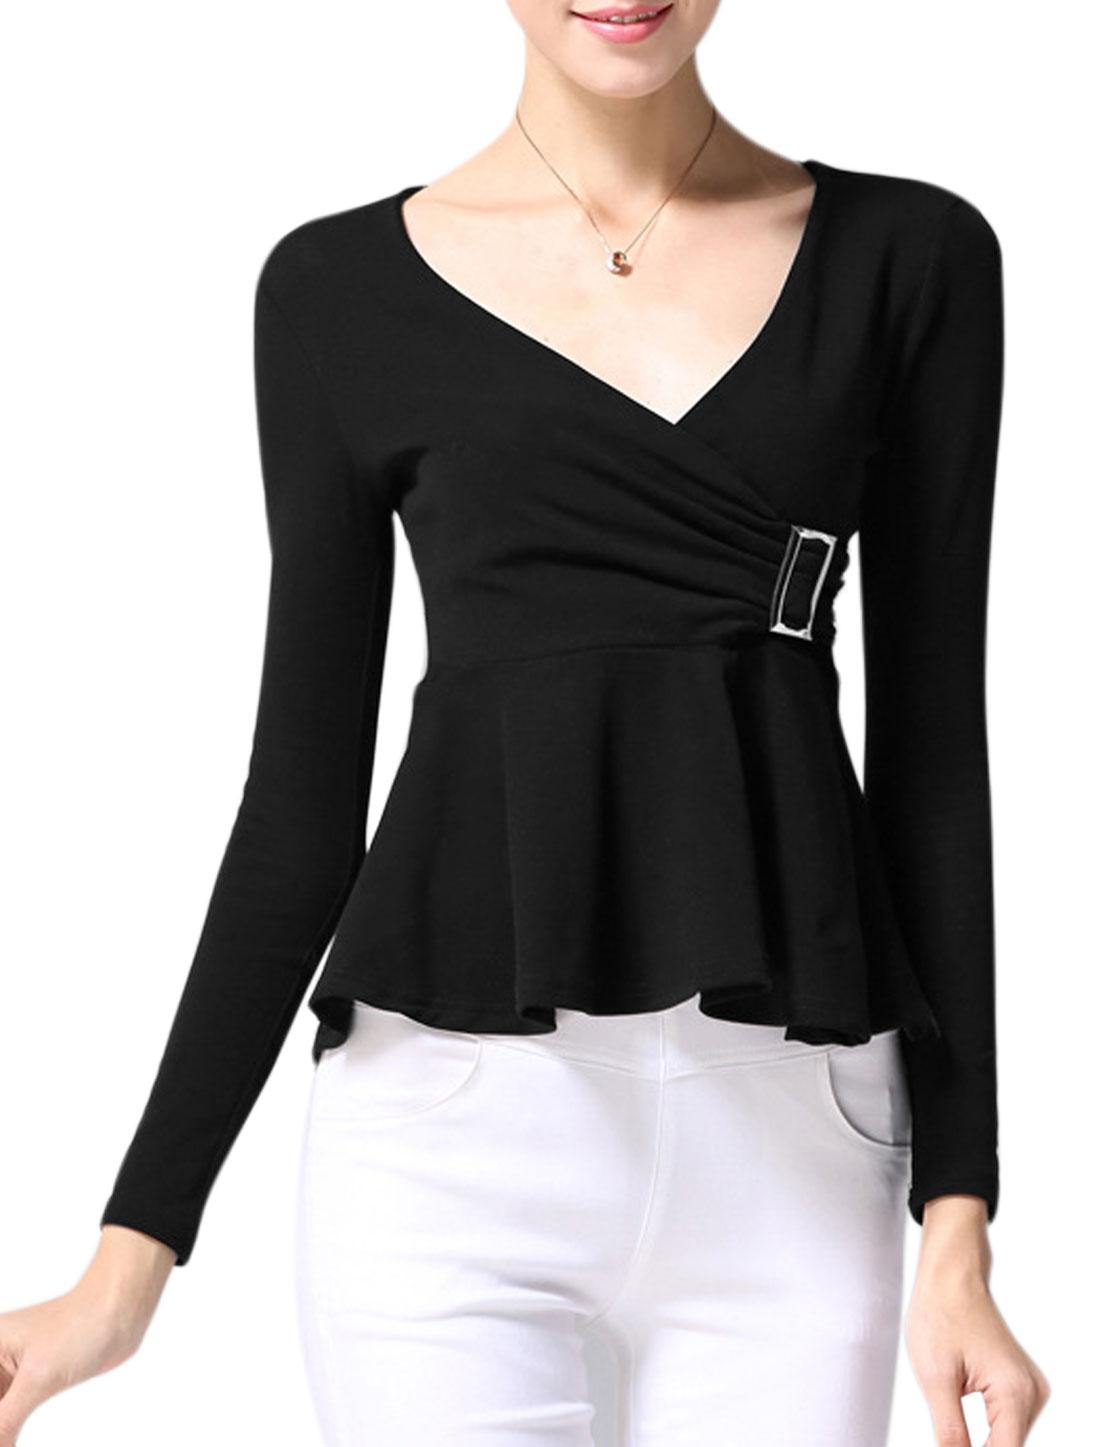 Women Crossover V Neck Long Sleeves Buckle Decor Peplum Top Black XS